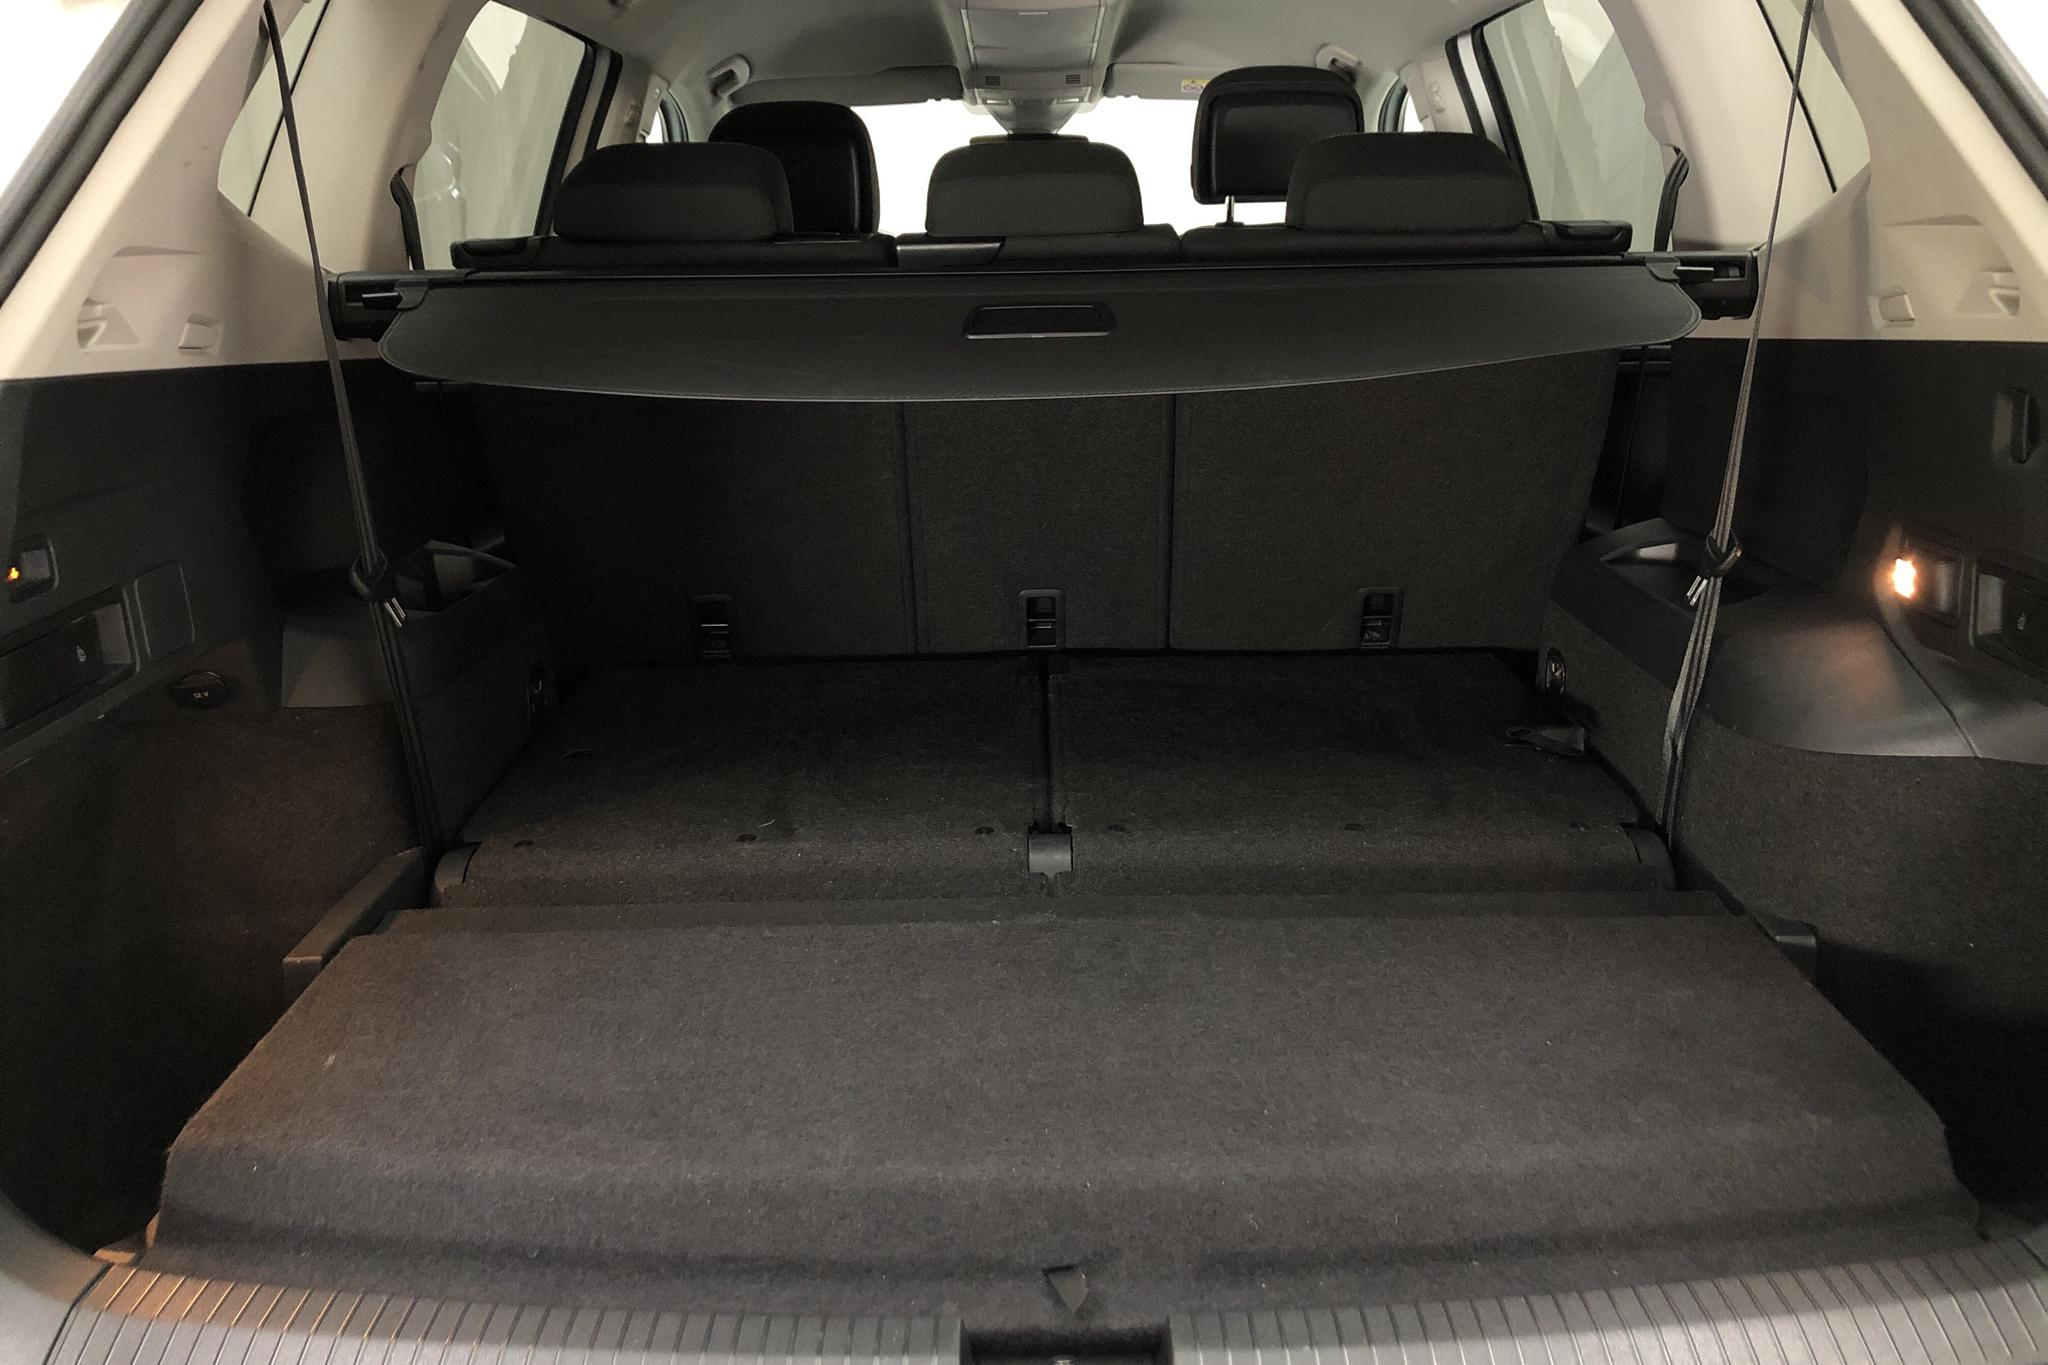 VW Tiguan Allspace 2.0 TDI 4MOTION (190hk) - 7 402 mil - Automat - vit - 2018